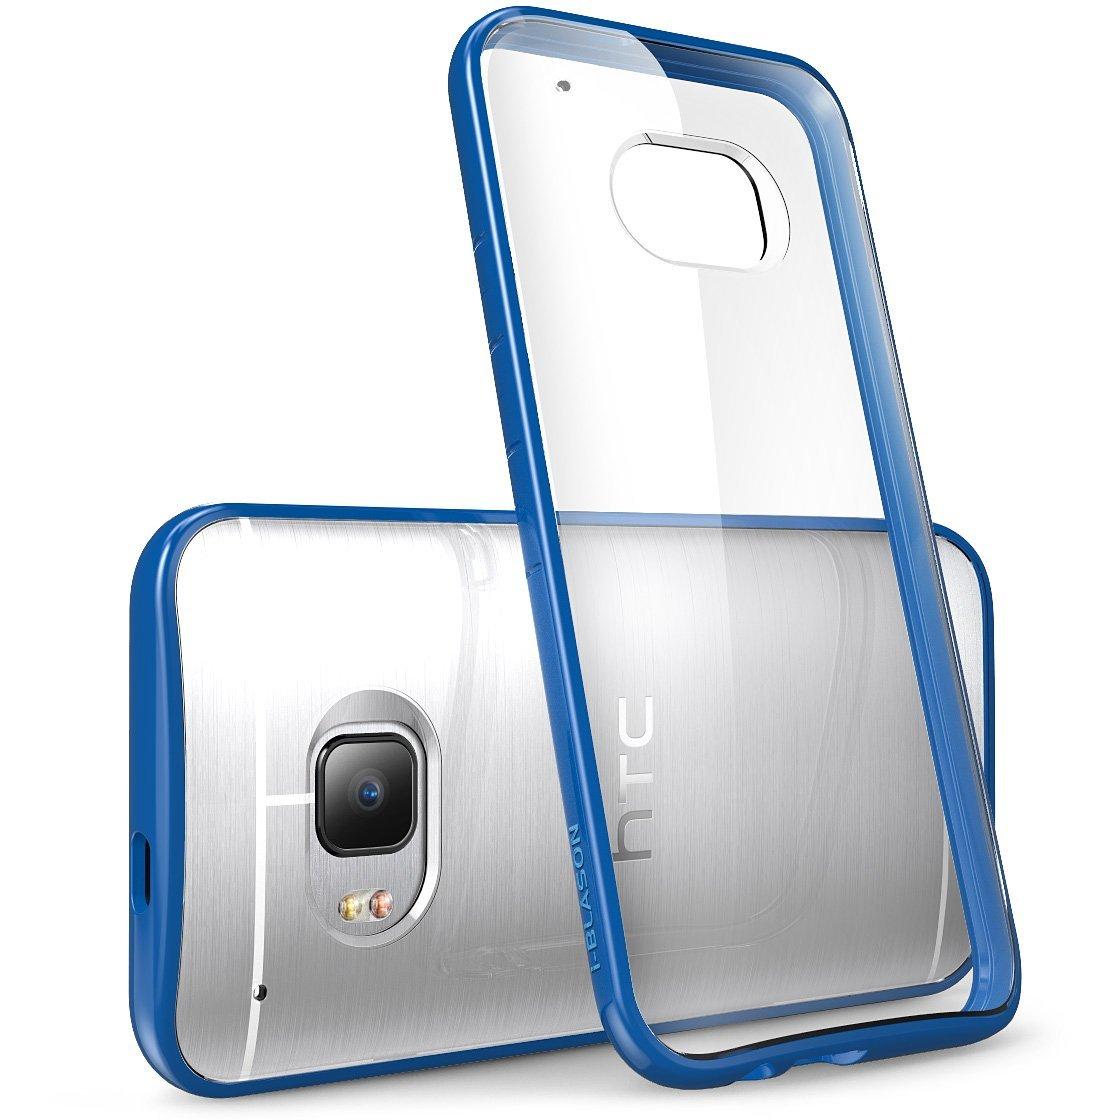 one m9 cases, htc one m9 cases, m9 cases, phone cases